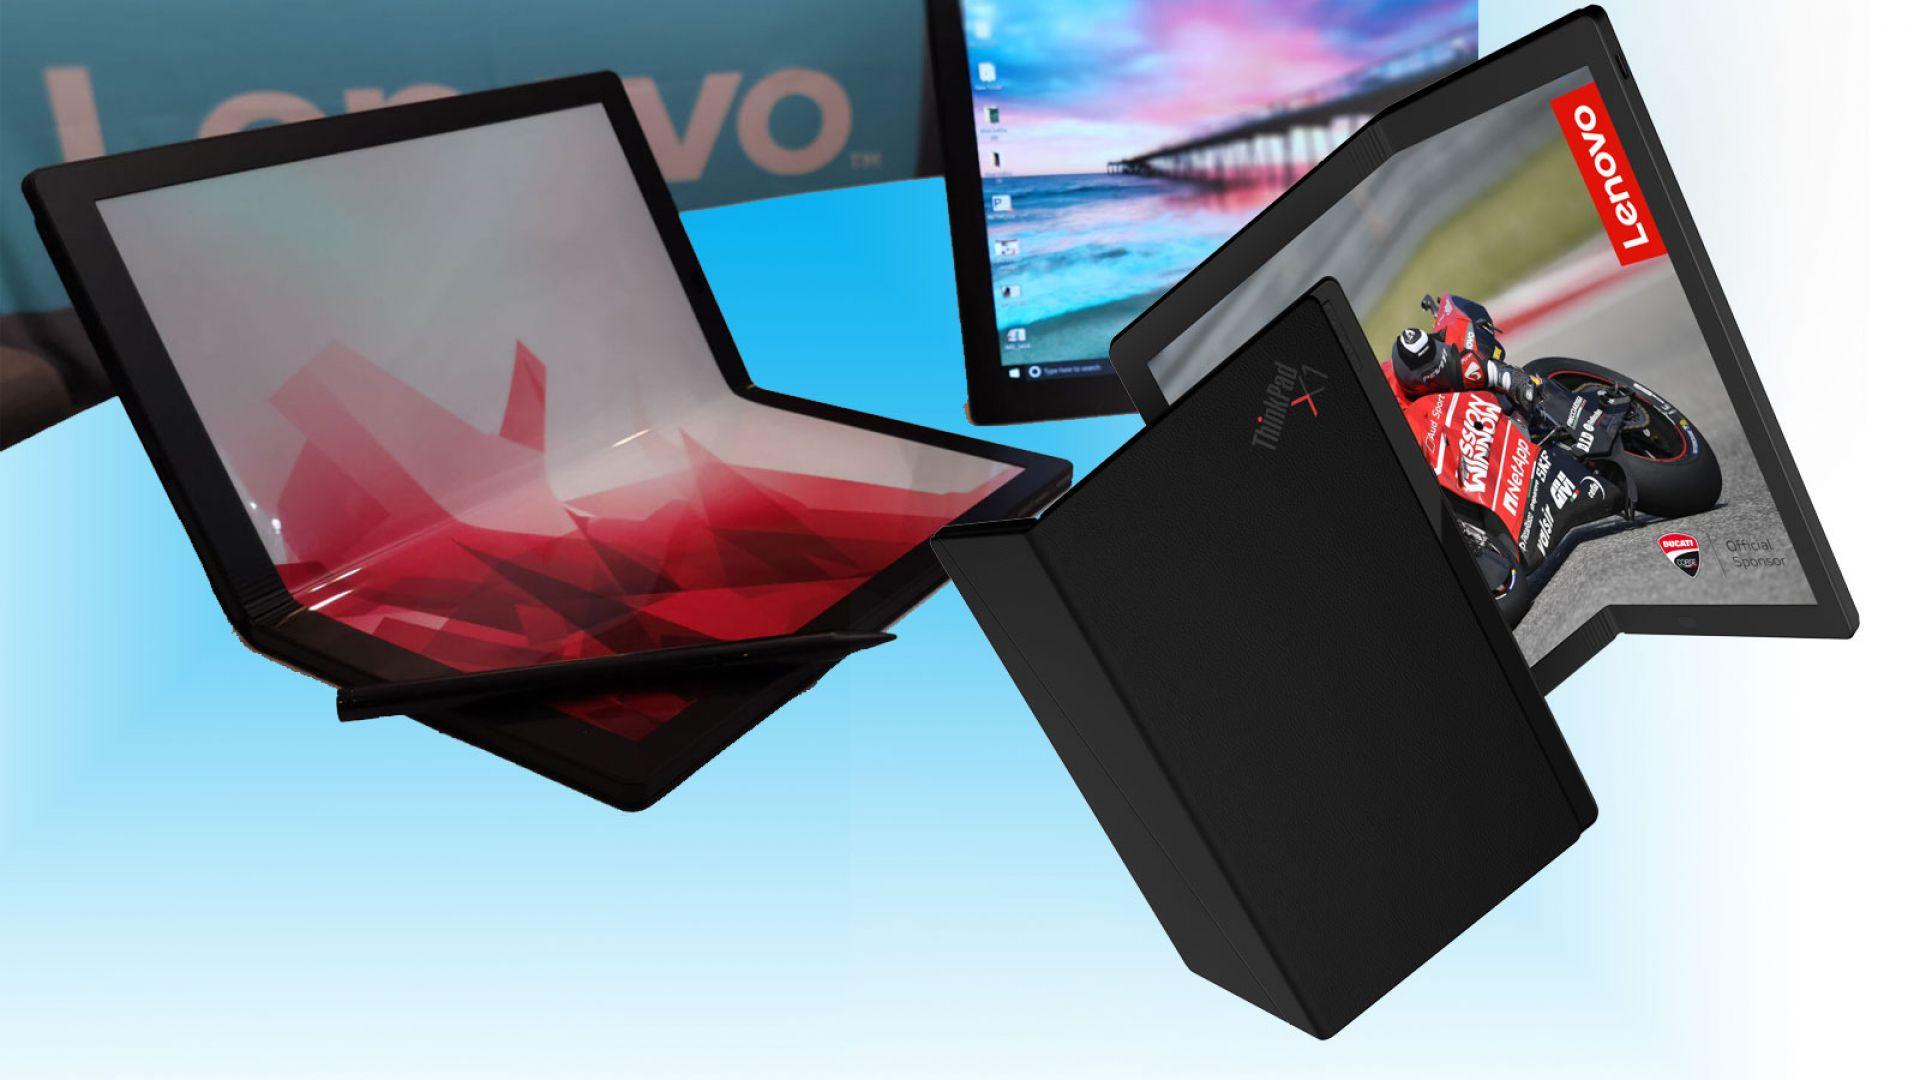 Lenovo демонстрира лаптоп със сгъваем дисплей